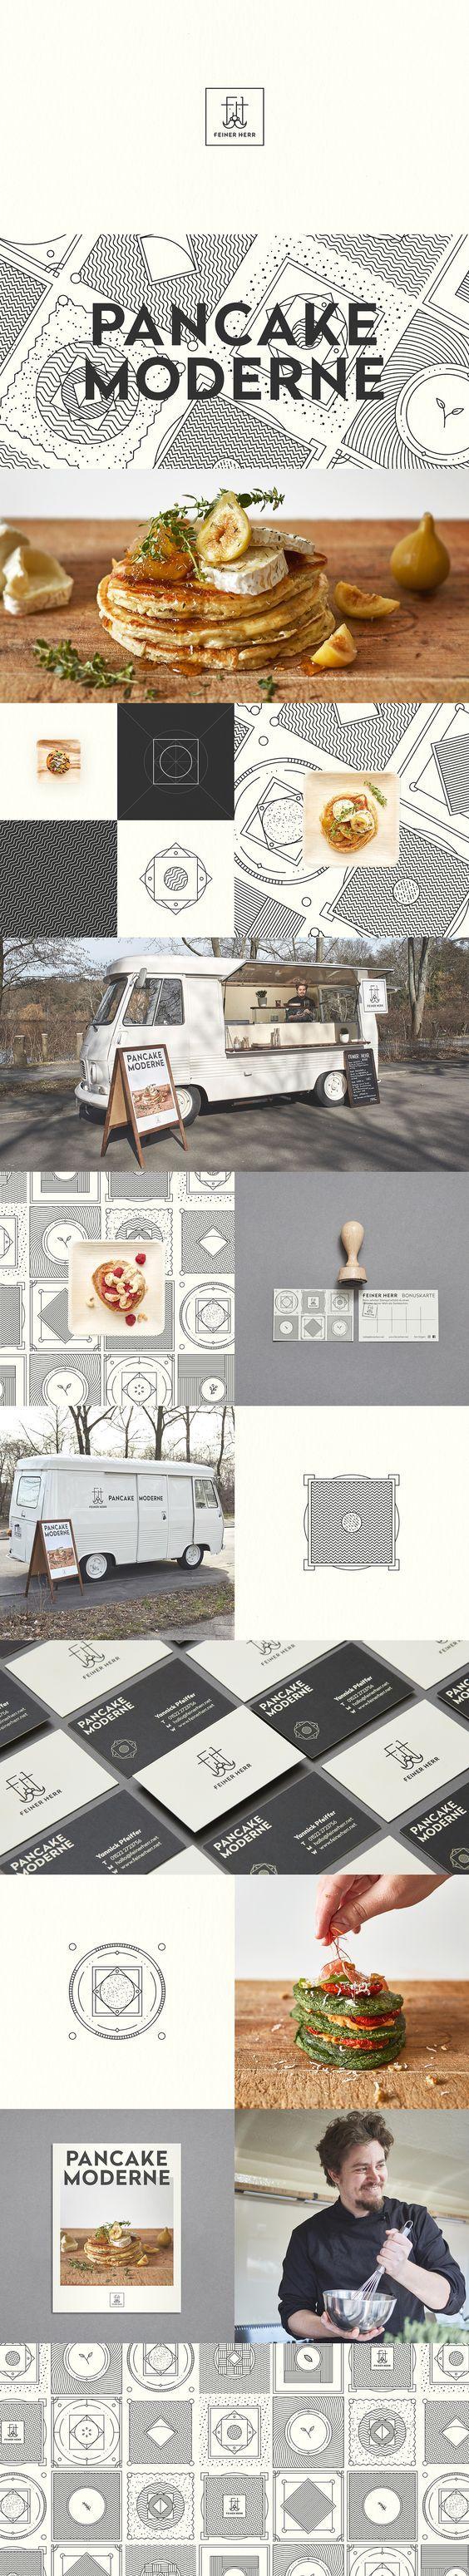 Feiner Herr Food Truck Branding by Hojin Kang   Fivestar Branding Agency – Design and Branding Agency & Curated Inspiration Gallery